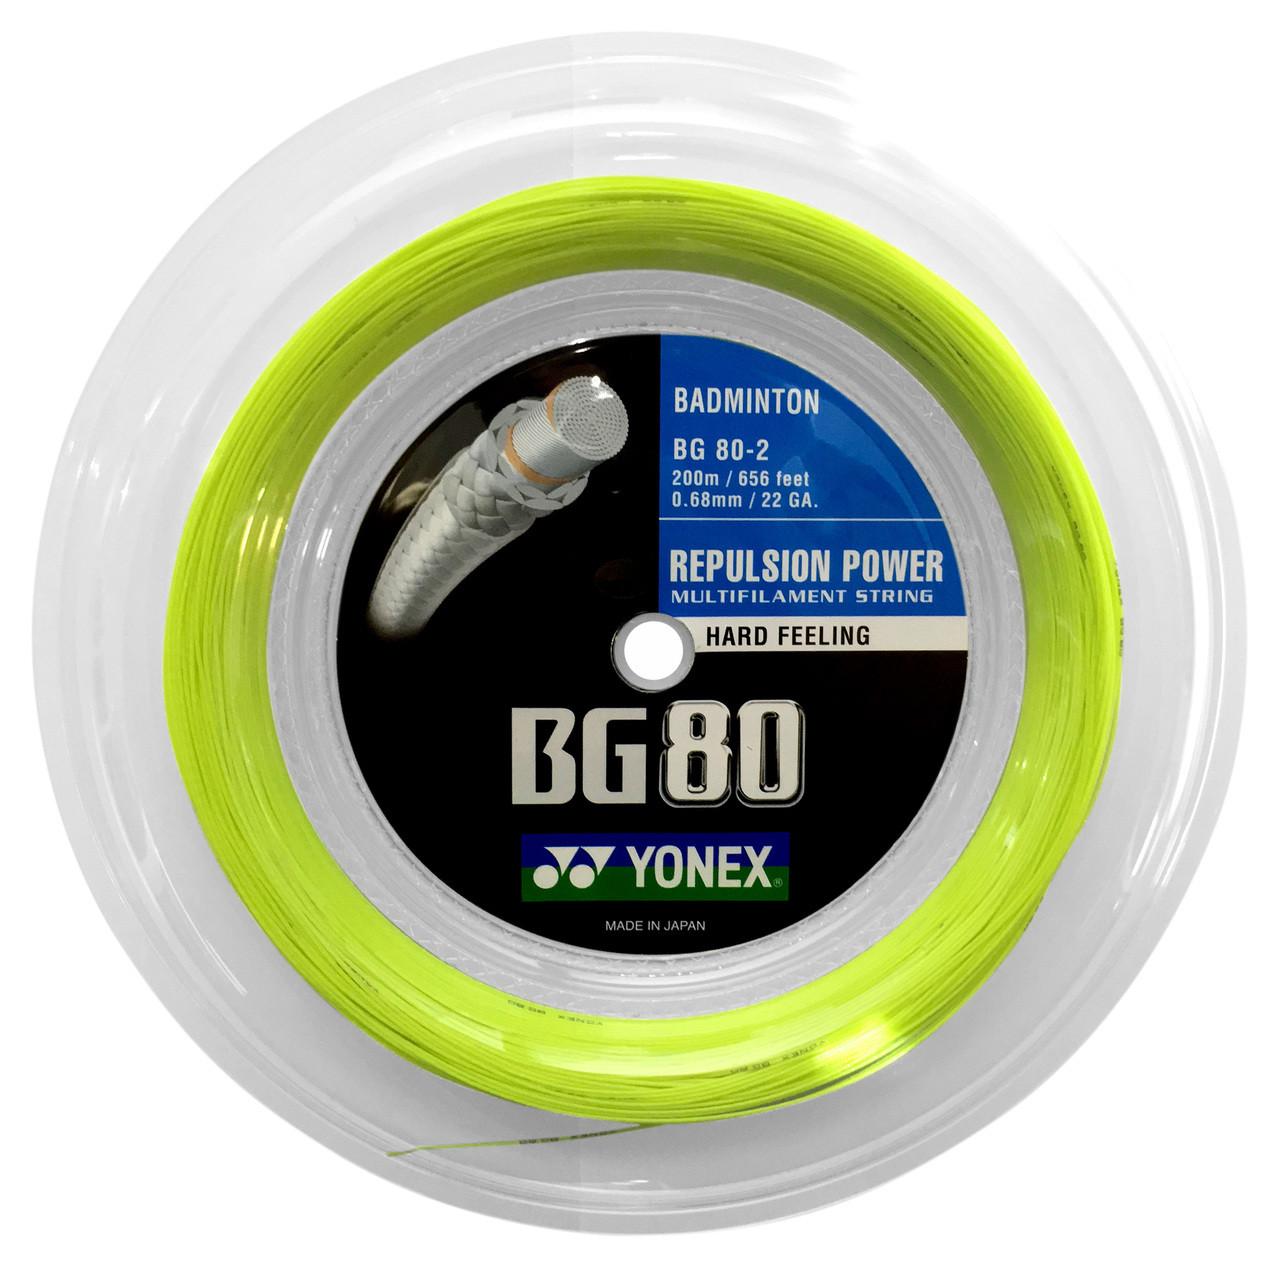 Yonex BG80 0.68mm Badminton 200M Reel - Racquet Depot UK